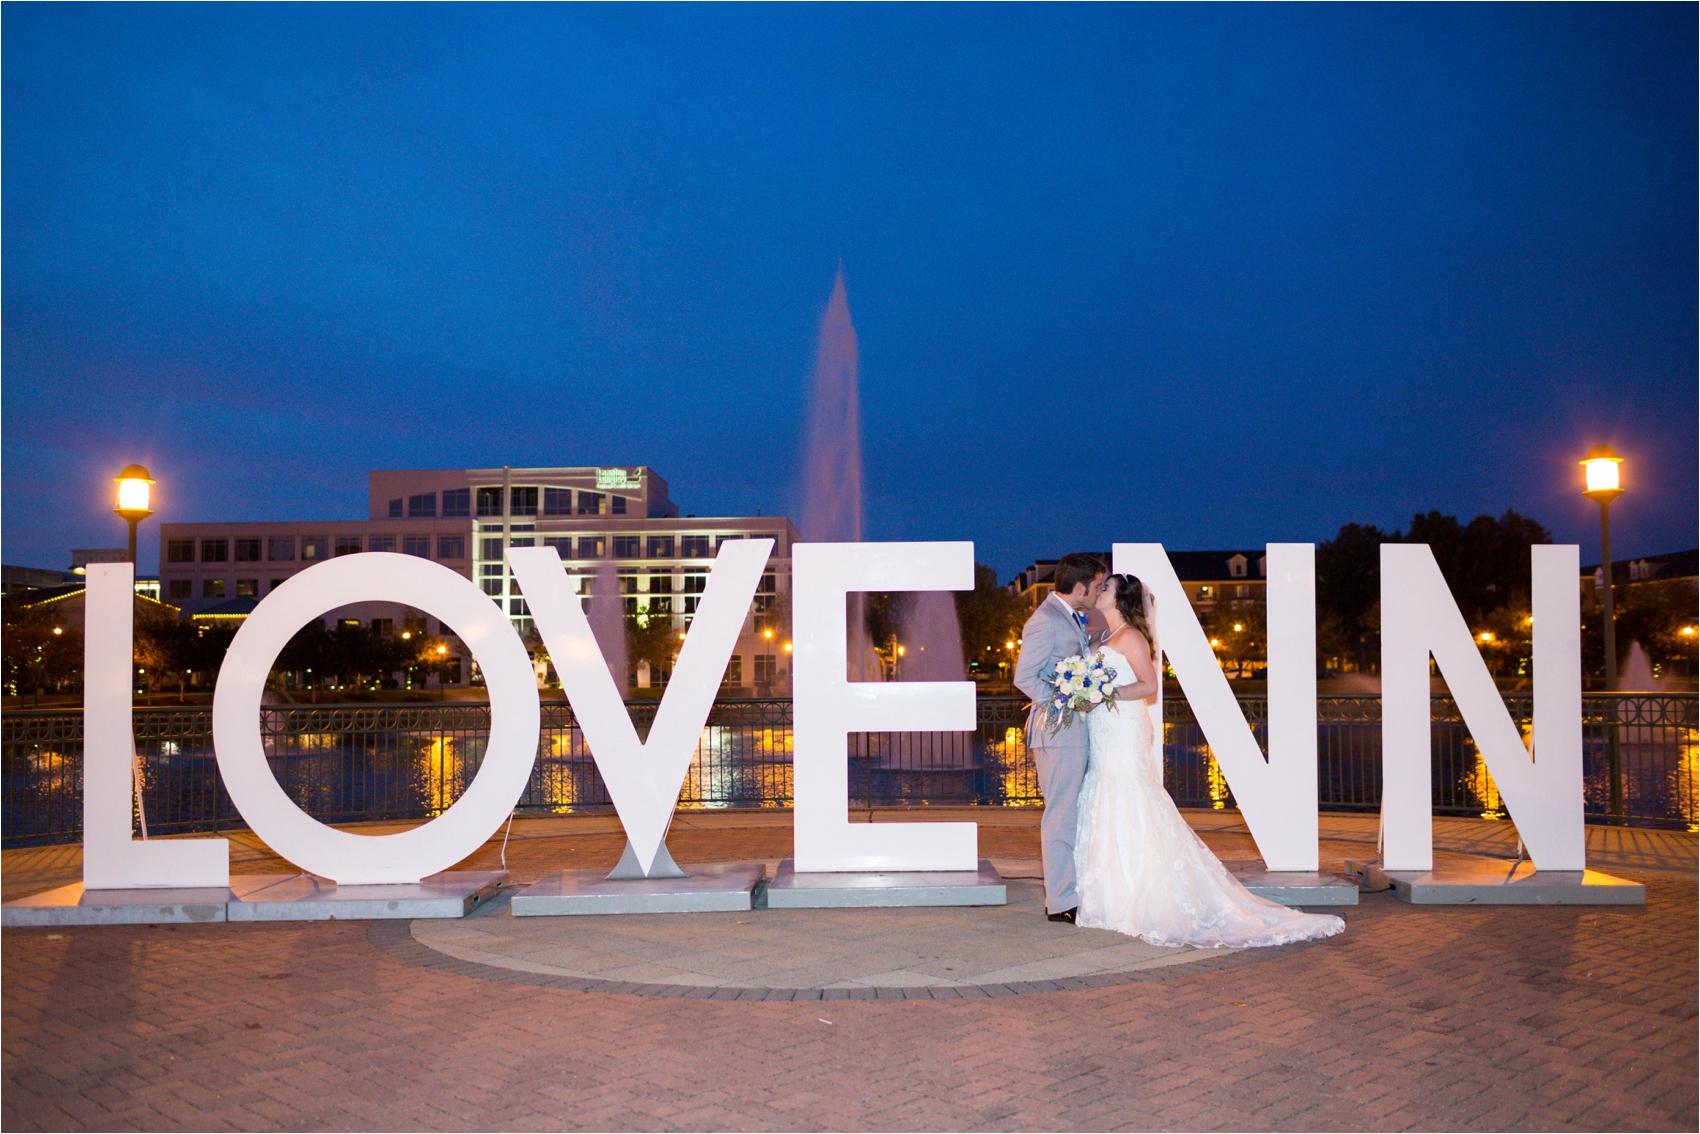 Newport-News-Winter-Wonderland-Wedding_0200.jpg